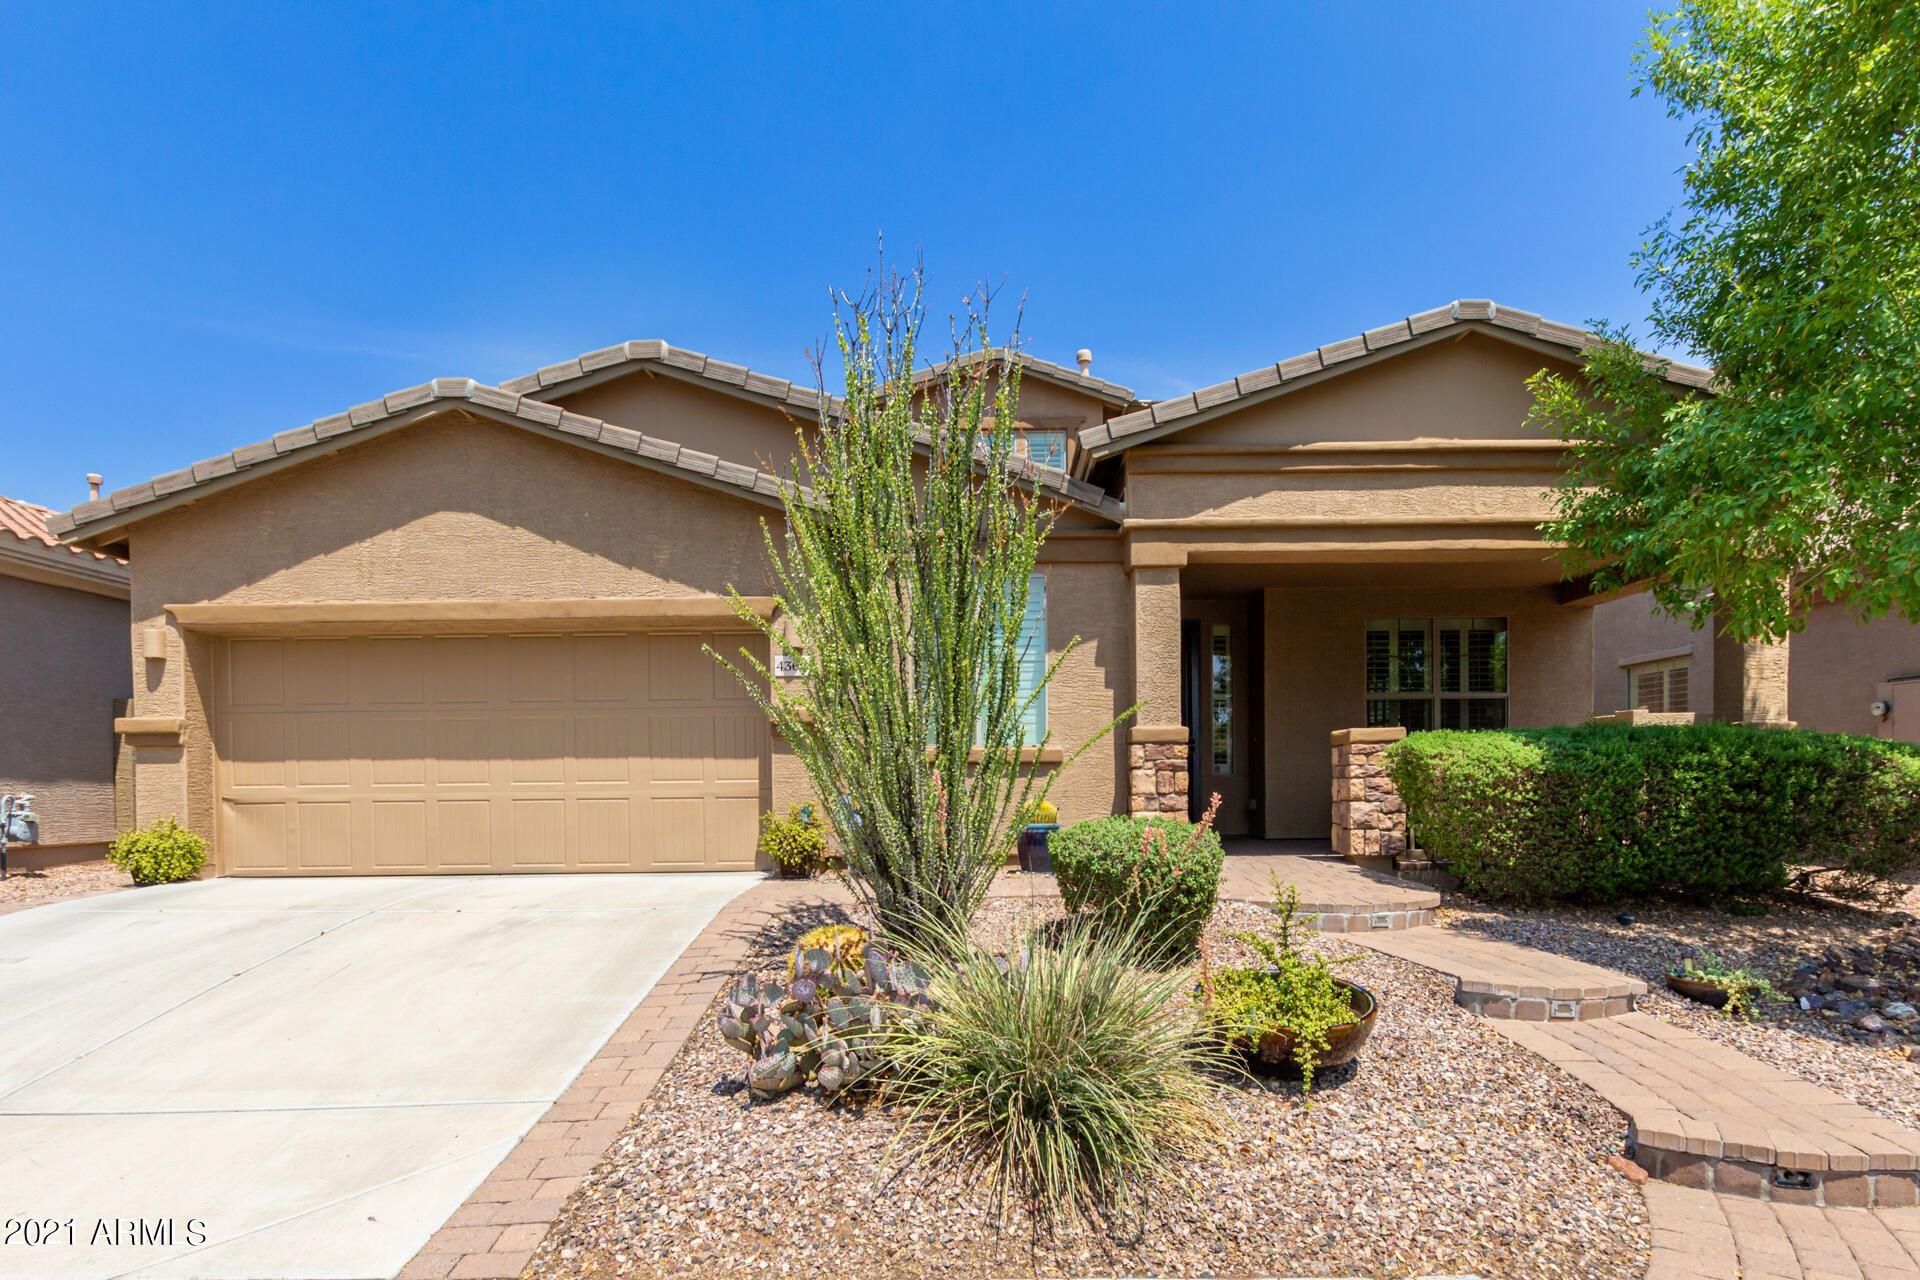 Photo of 43601 N 43RD Drive, New River, AZ 85087 (MLS # 6264712)